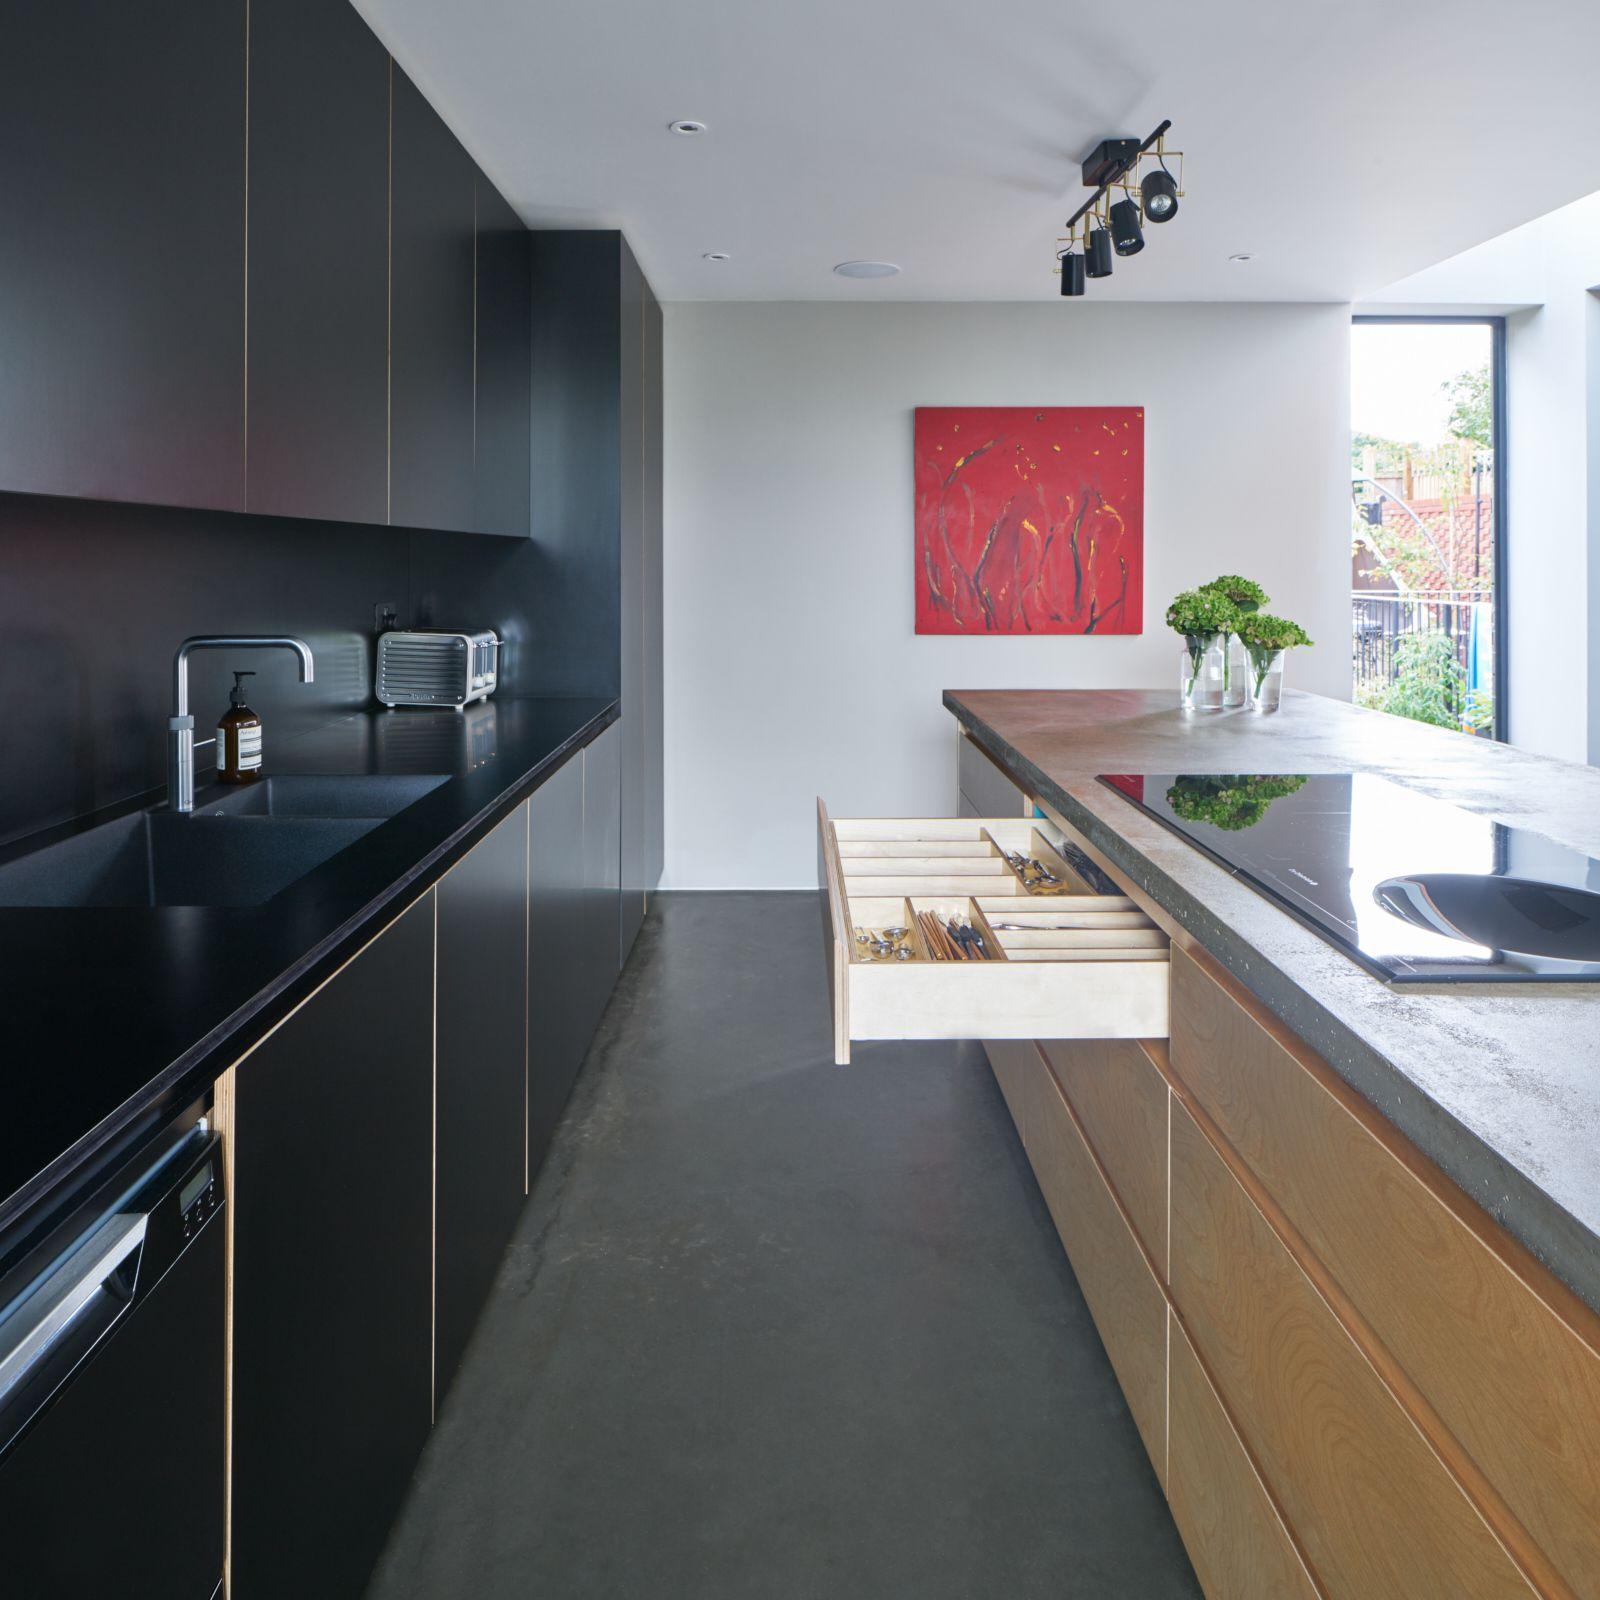 Kitchen Ideas With Black Worktops: Worktop & Splashback Are Both Diamond Black Matt Formica